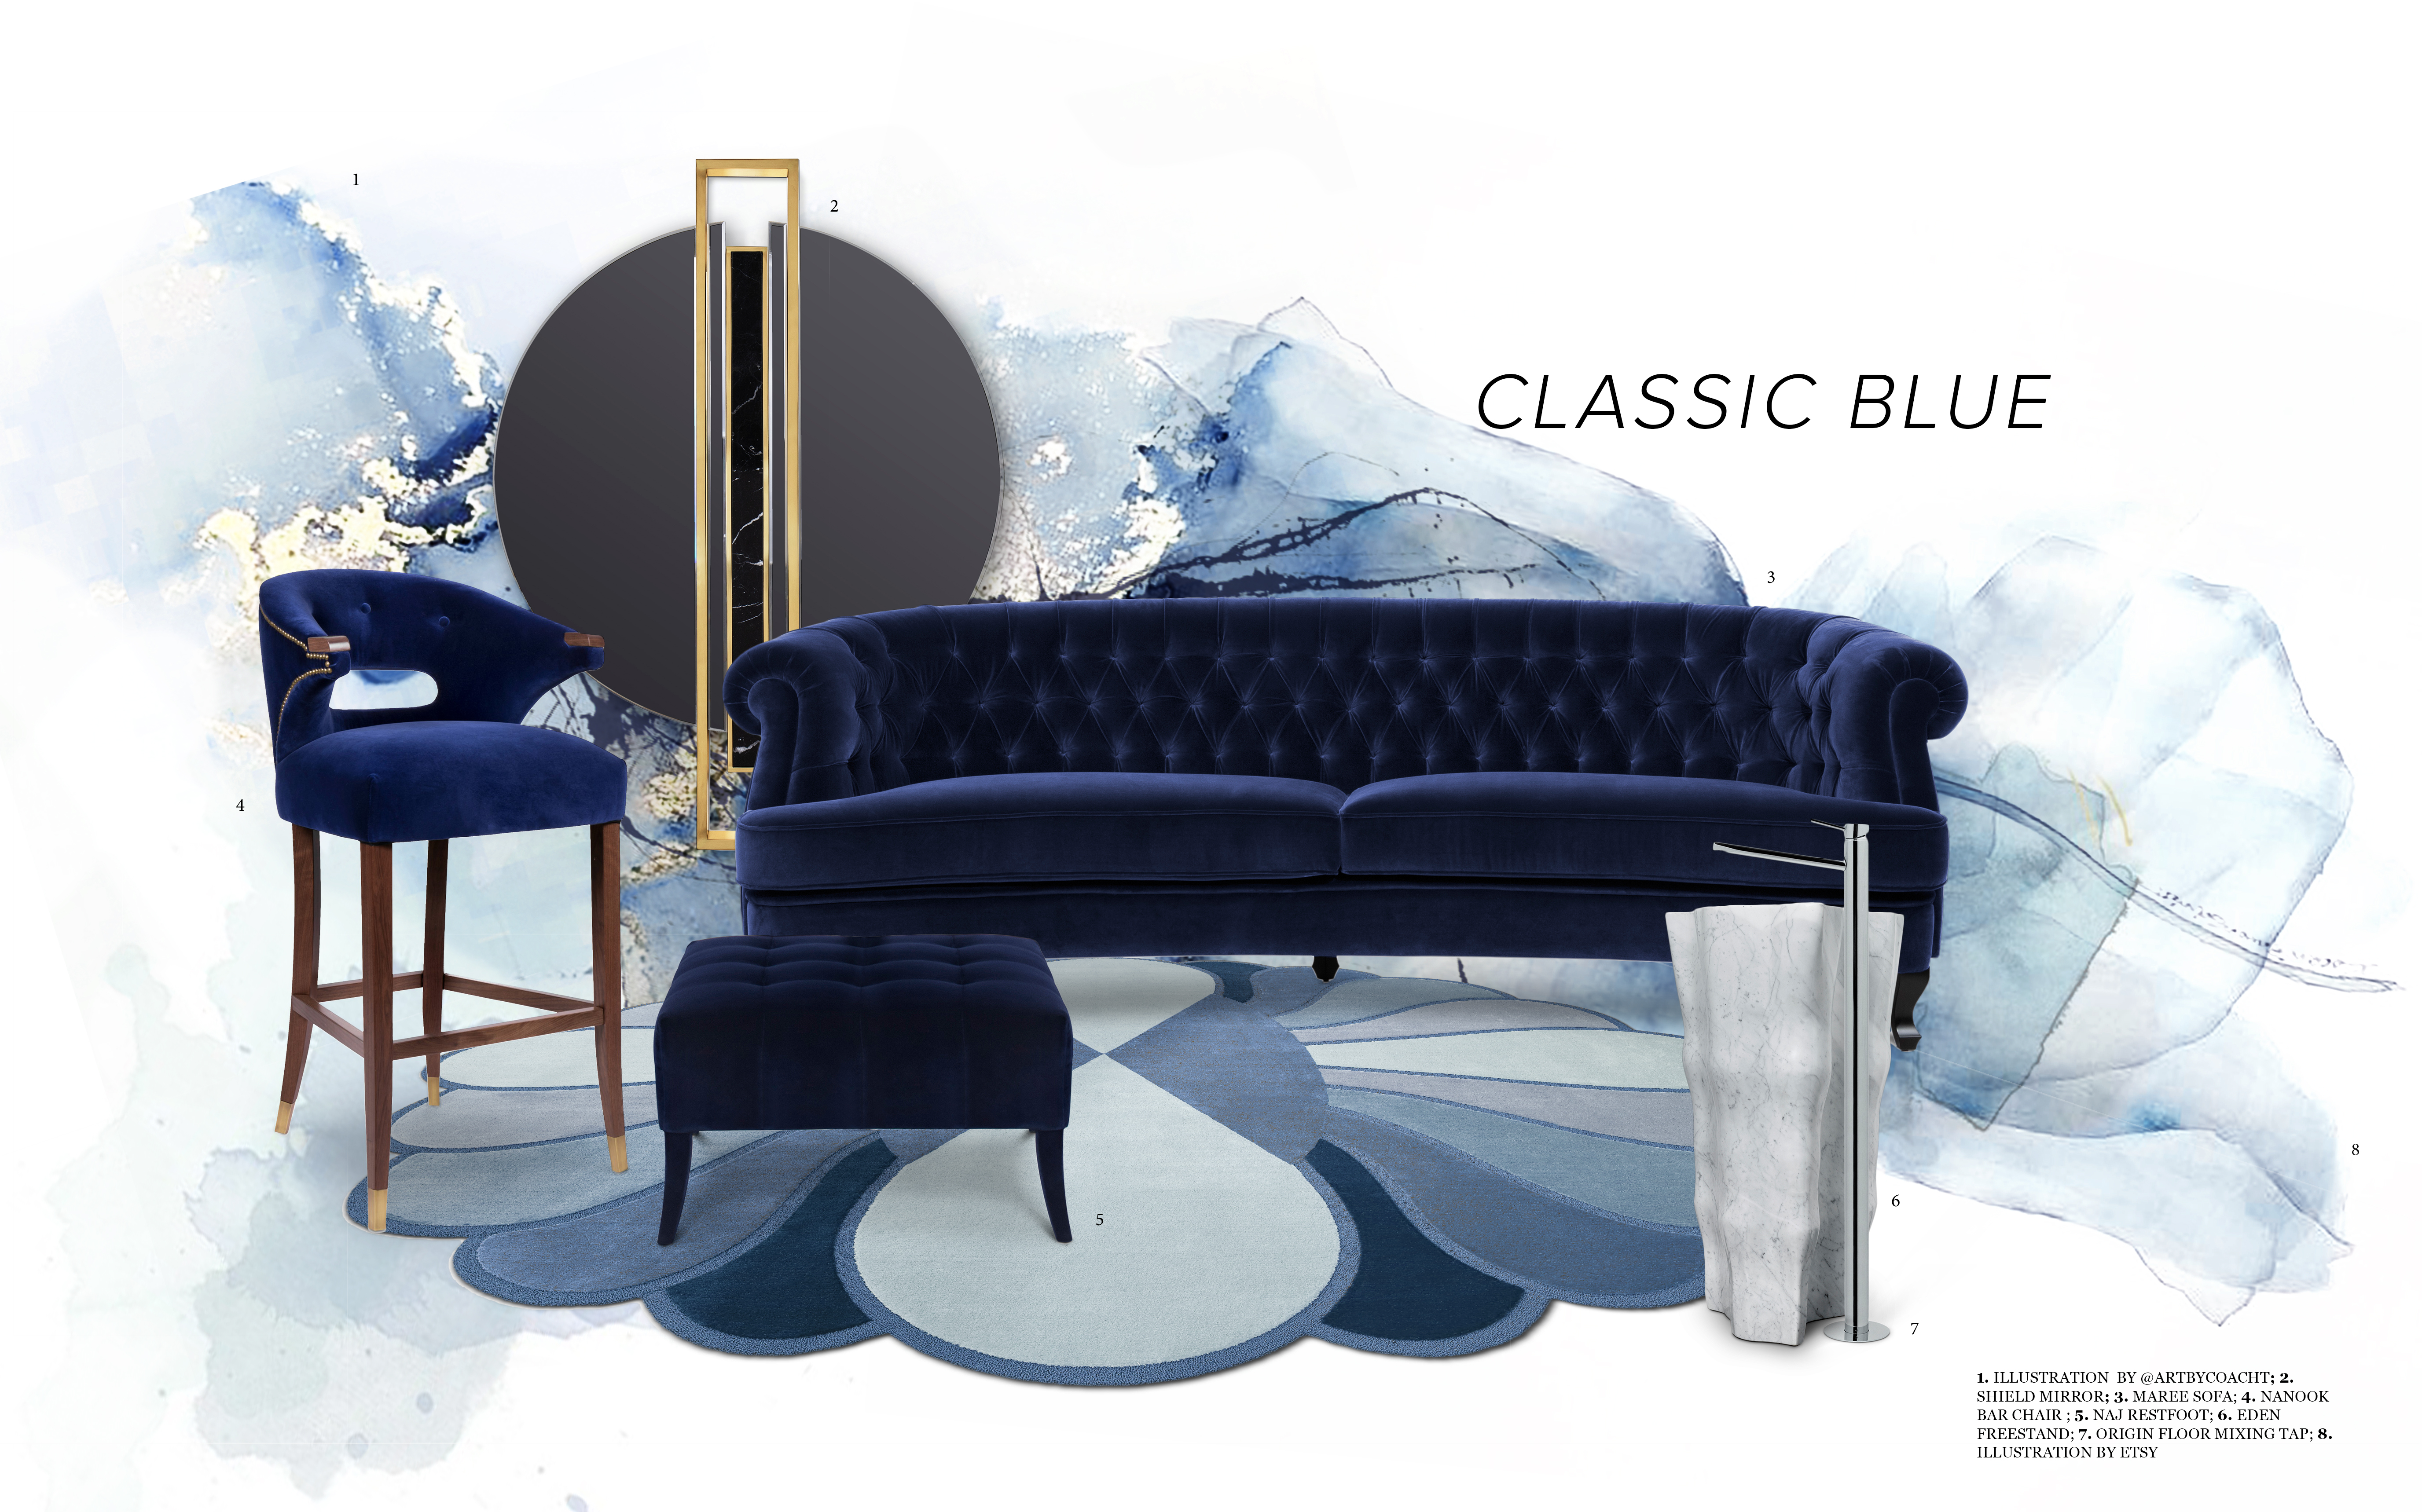 pantone's colour of the year 2020 3 Bathroom Designs to Add Pantone's Colour of the Year 2020 to Your Home classic blue